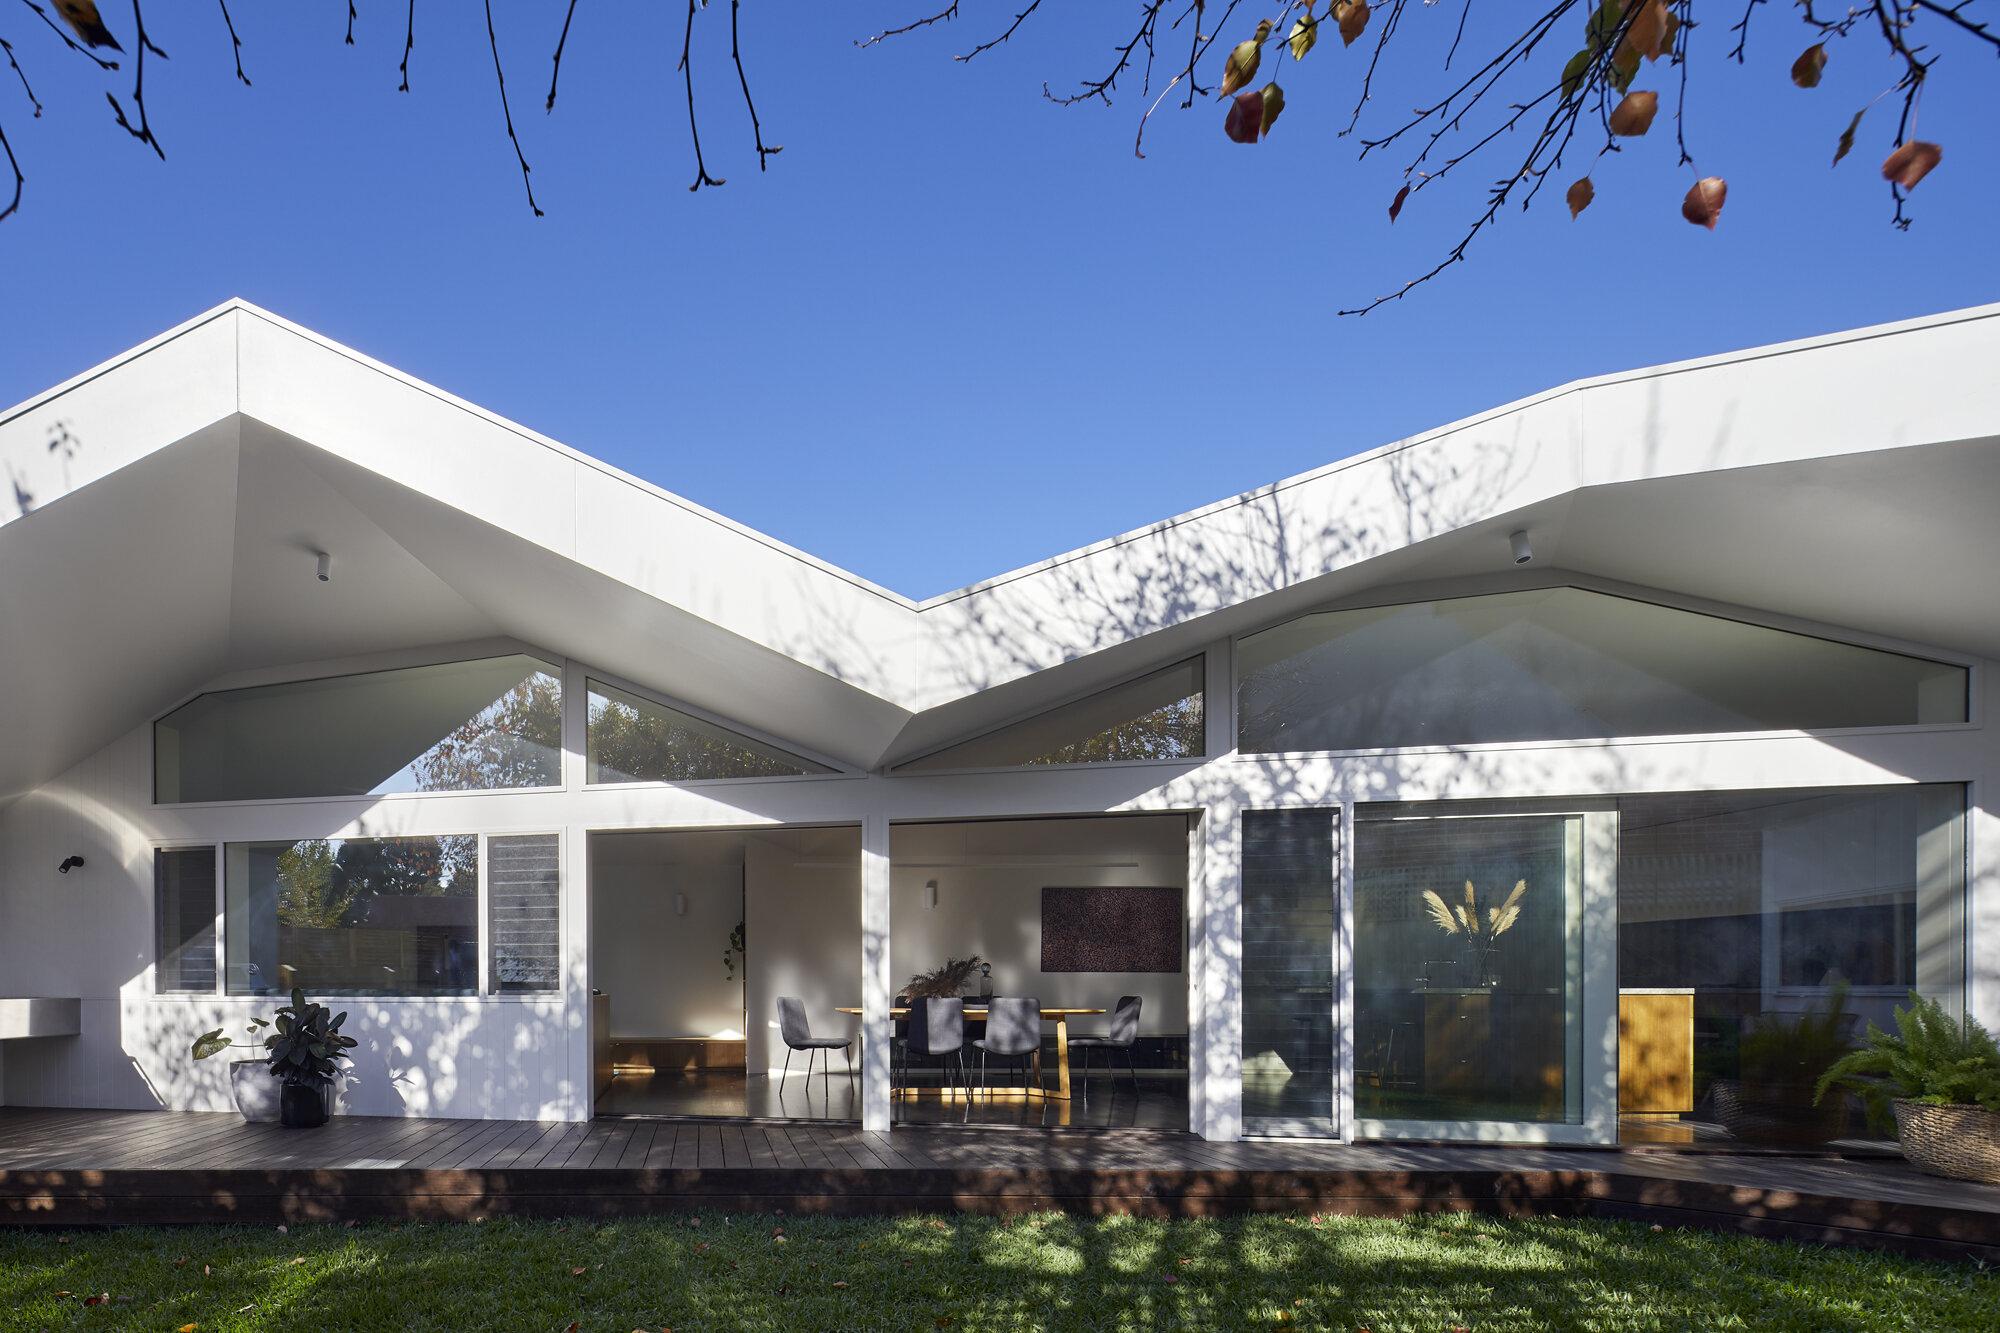 Clad Pad by Mihaly Slocombe Architects | Photographed by Tatjana Plitt